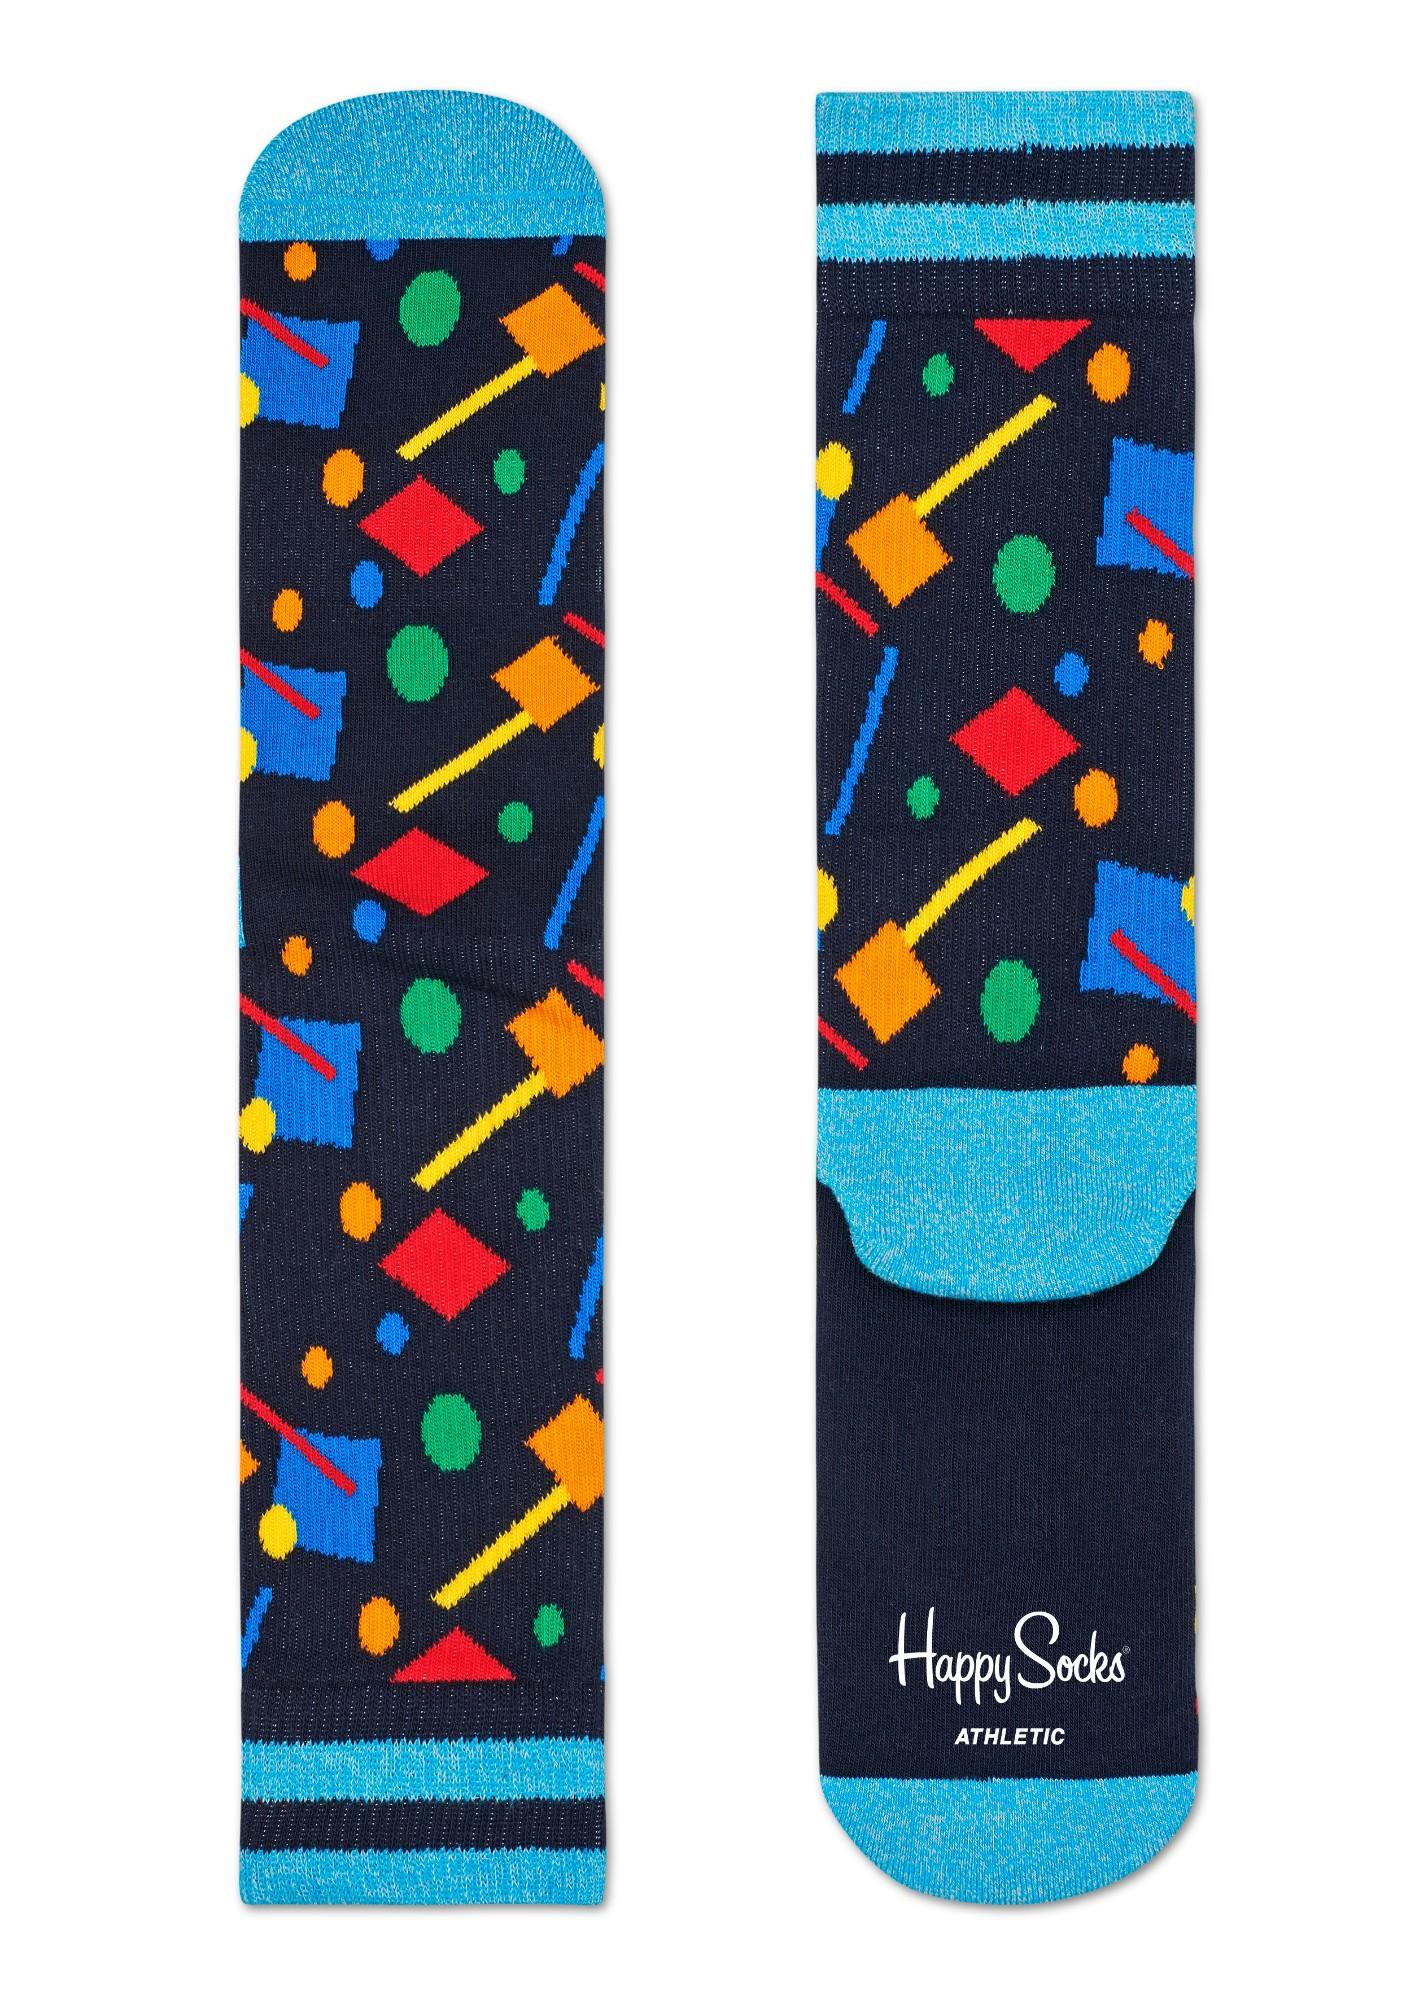 Happy Socks Athletic Confetti Multi 6500 36-40